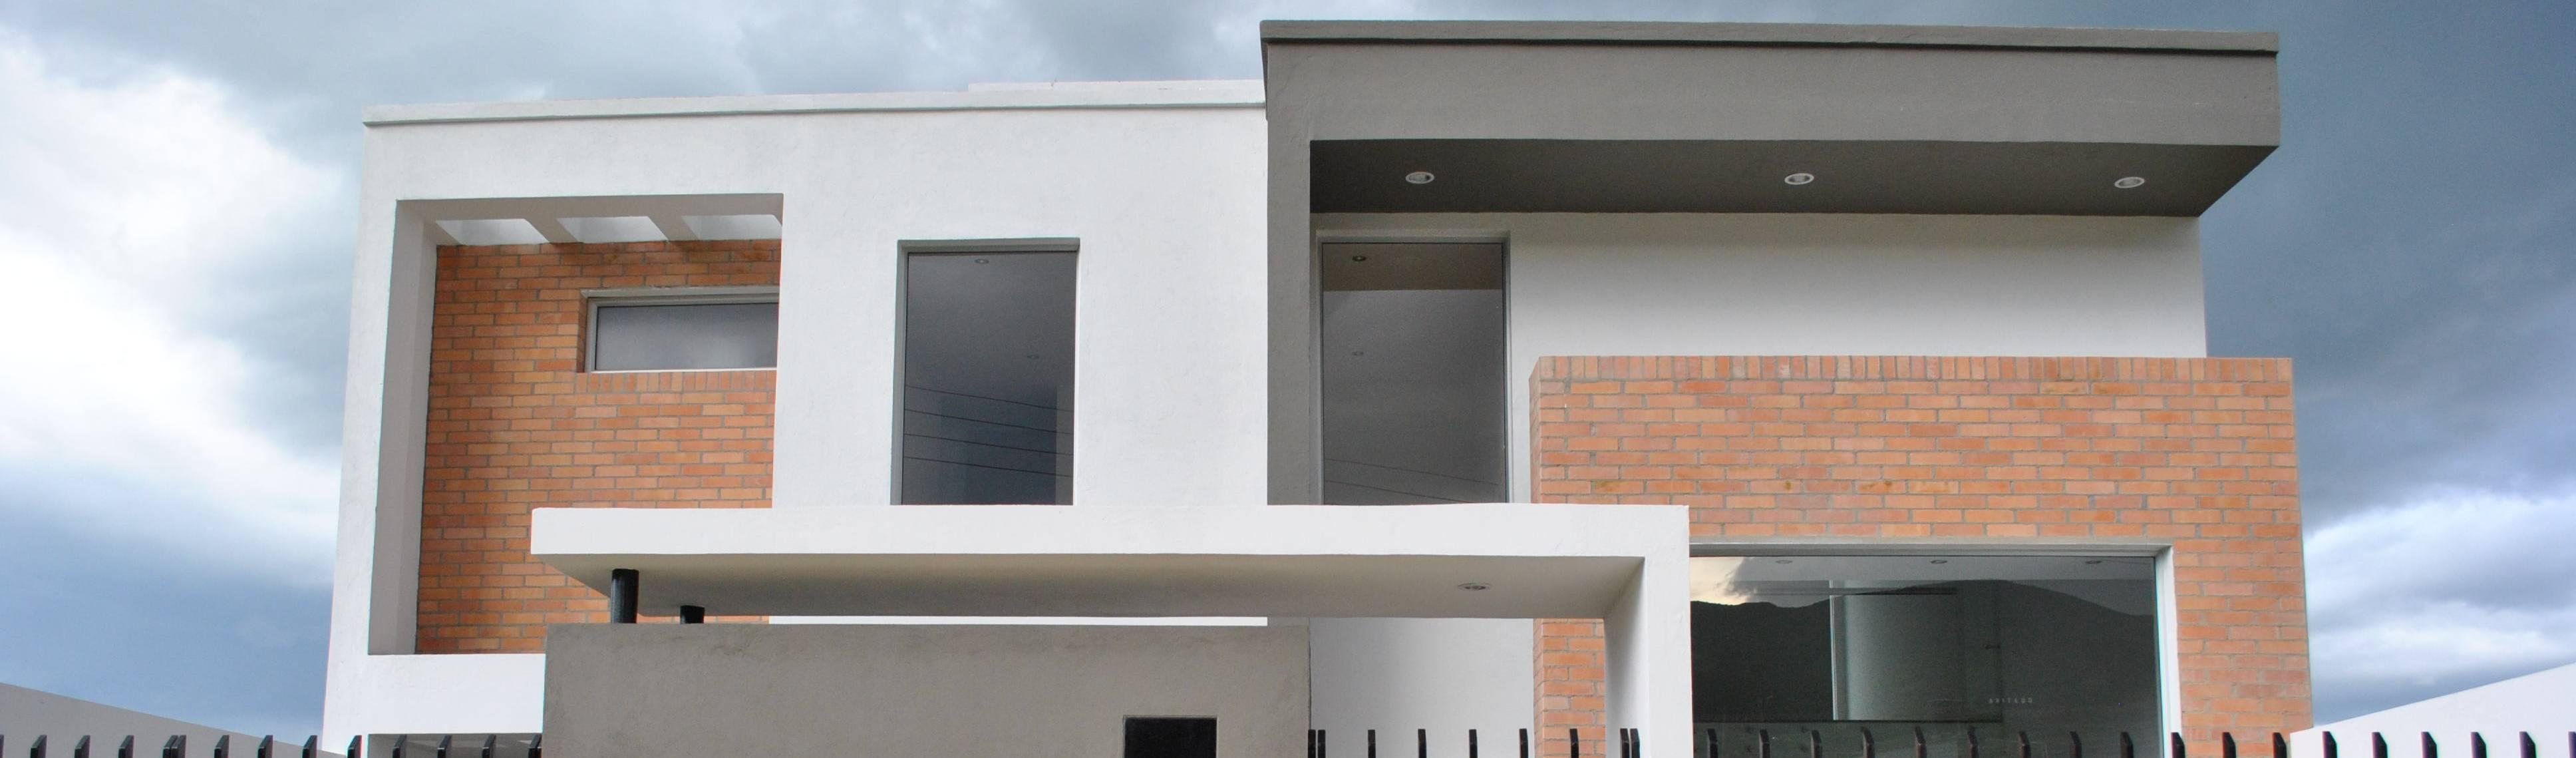 Francisco Forero Aponte – Arquitecto